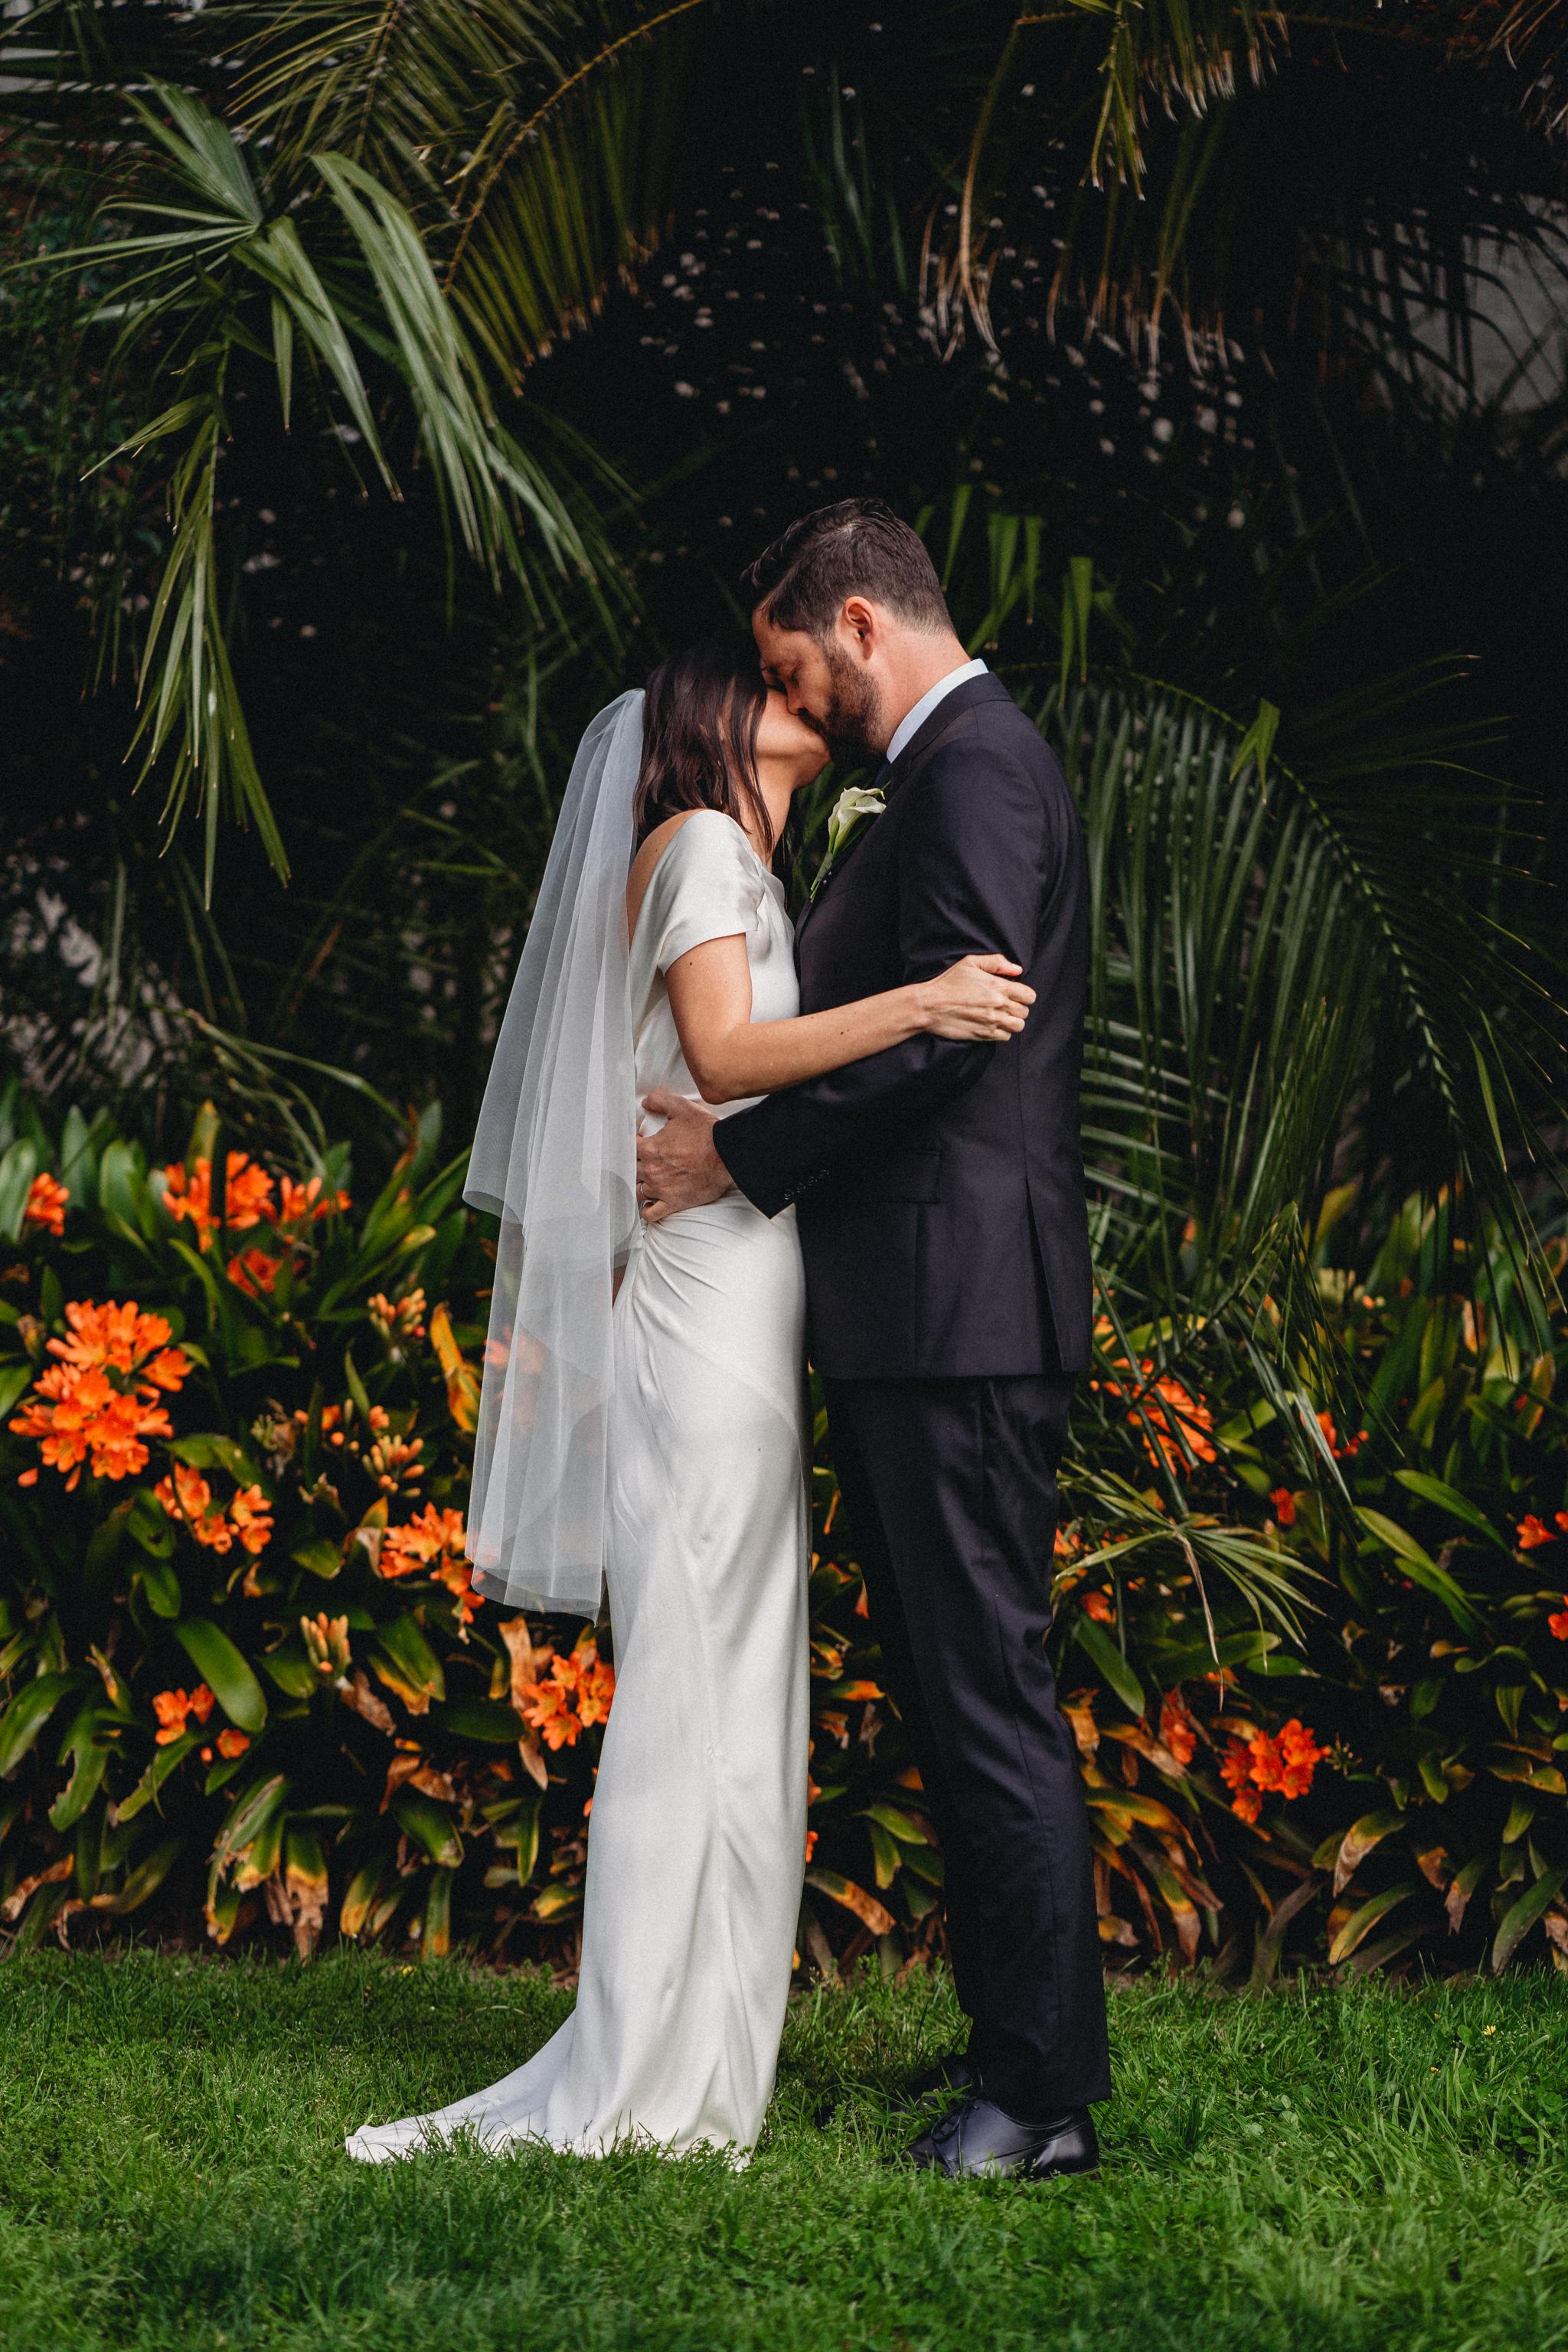 wedding-photography-santa-barbara-courthouse-rebeccaylasotras-94.jpg